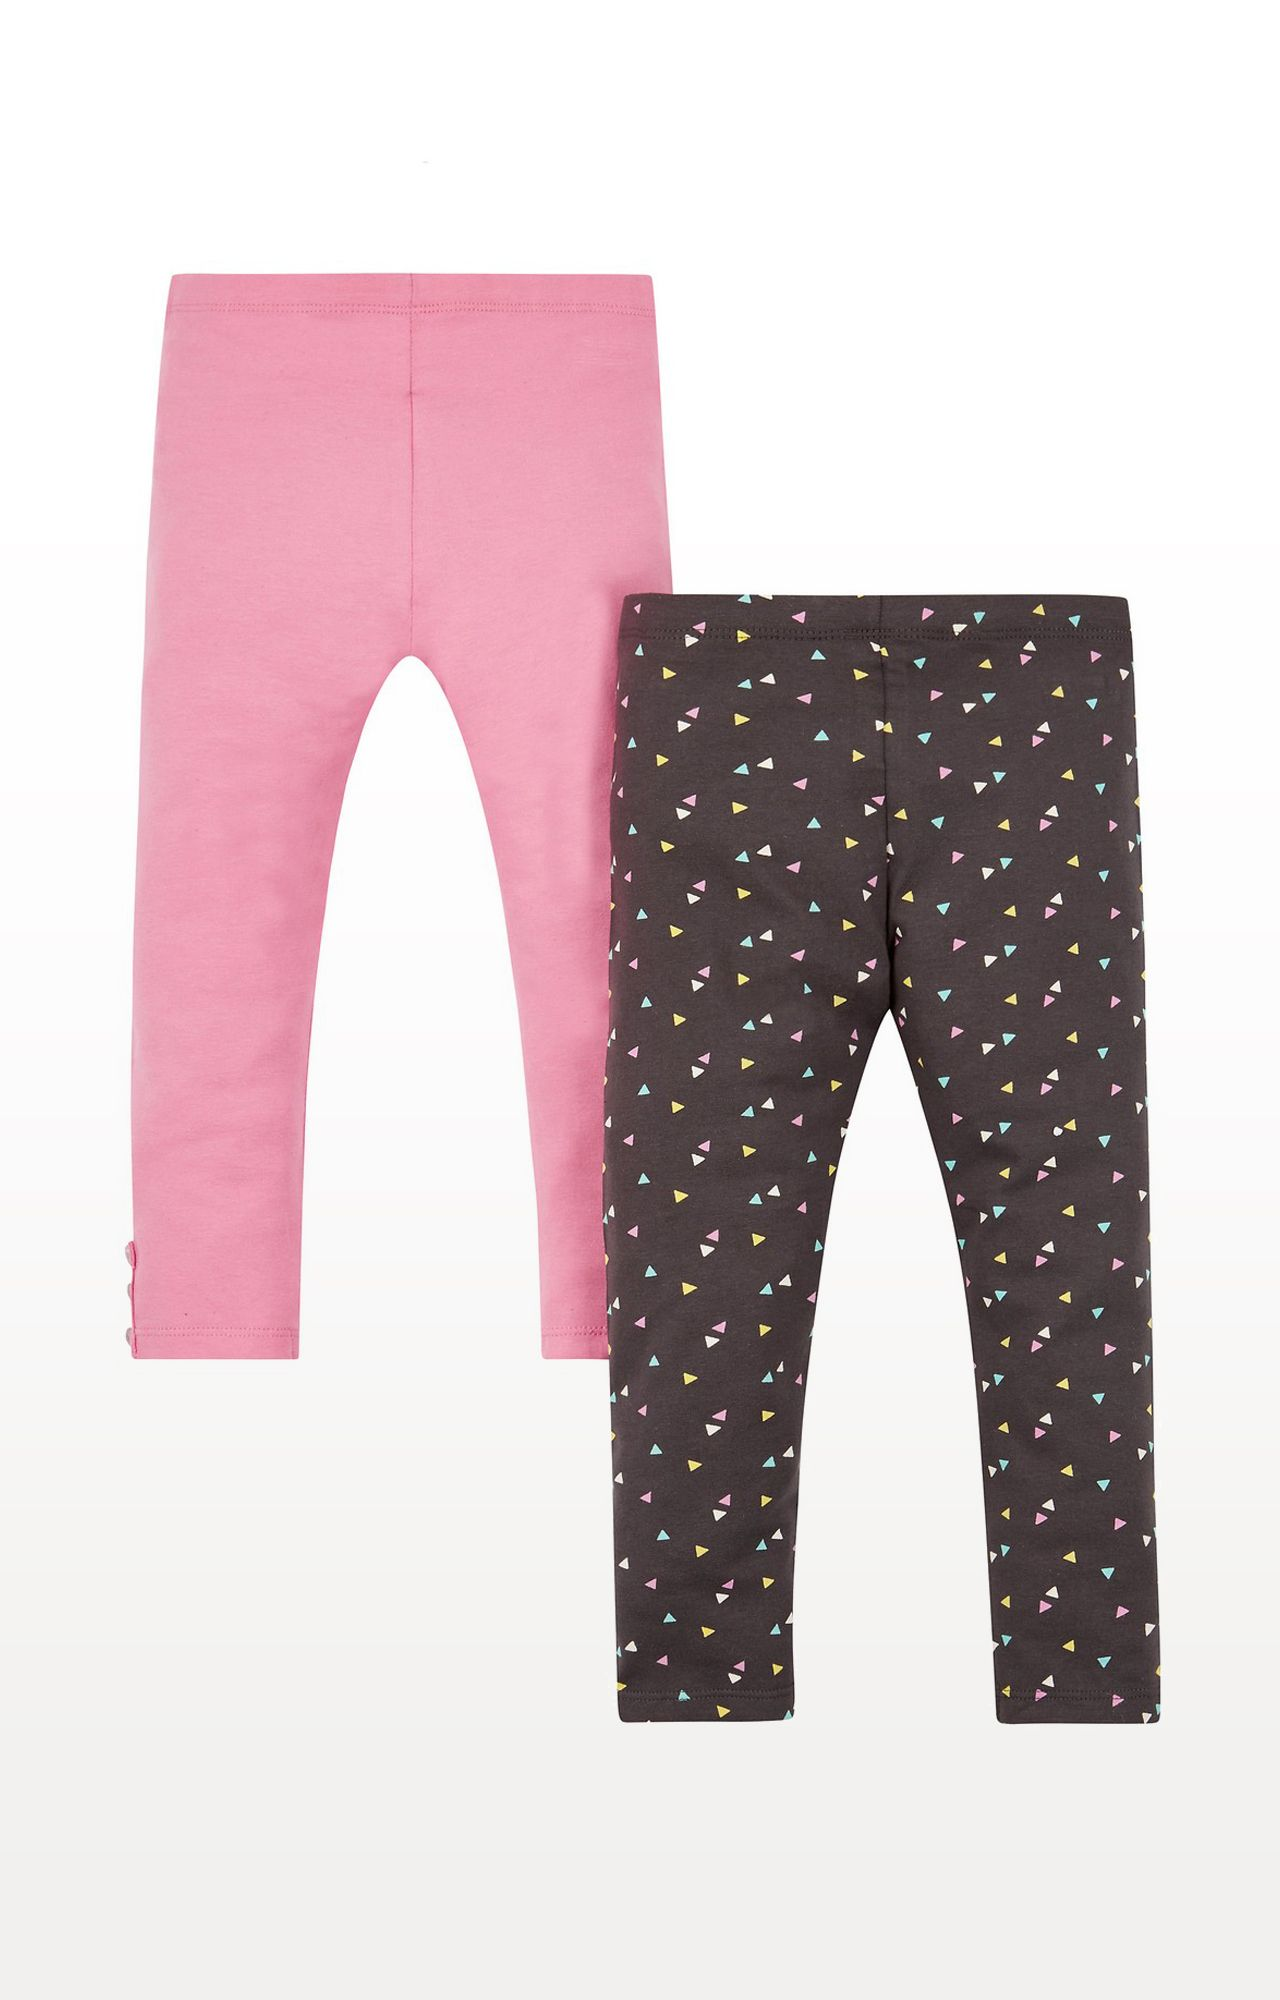 Mothercare | Pink & Black Printed Geo Leggings - Pack of 2